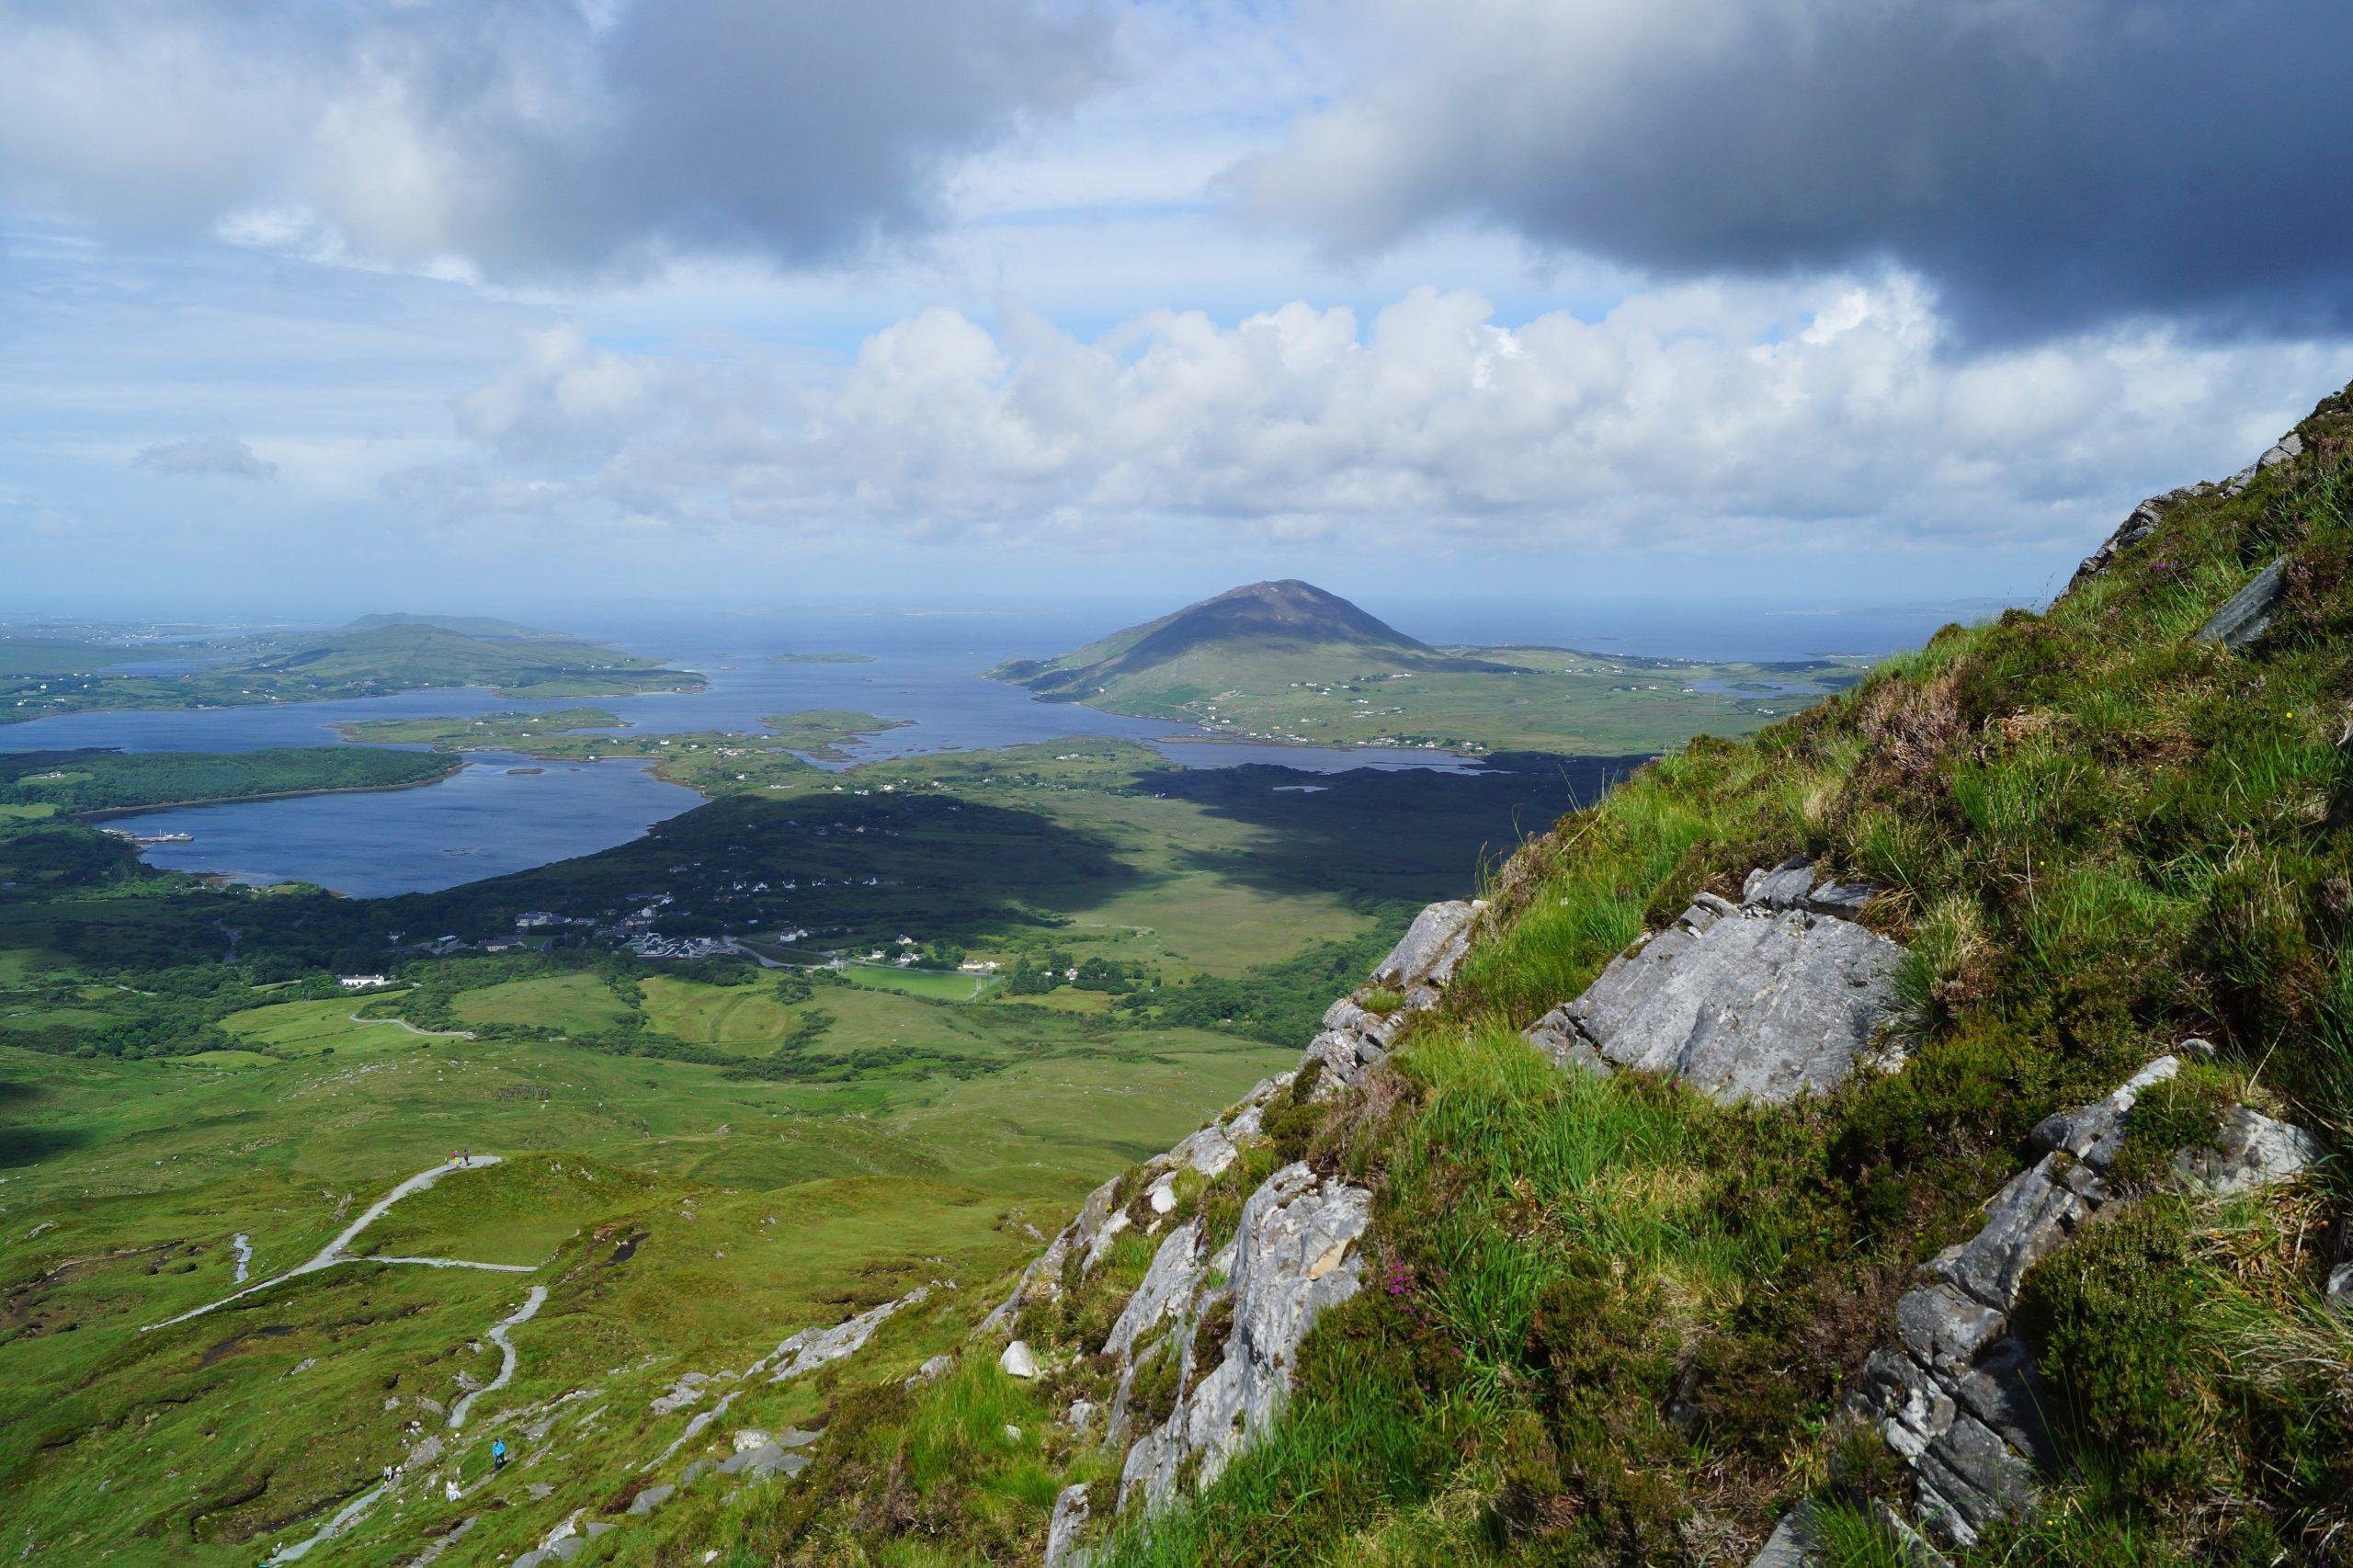 Connemara National Park Hiking Trails - Visit Galway